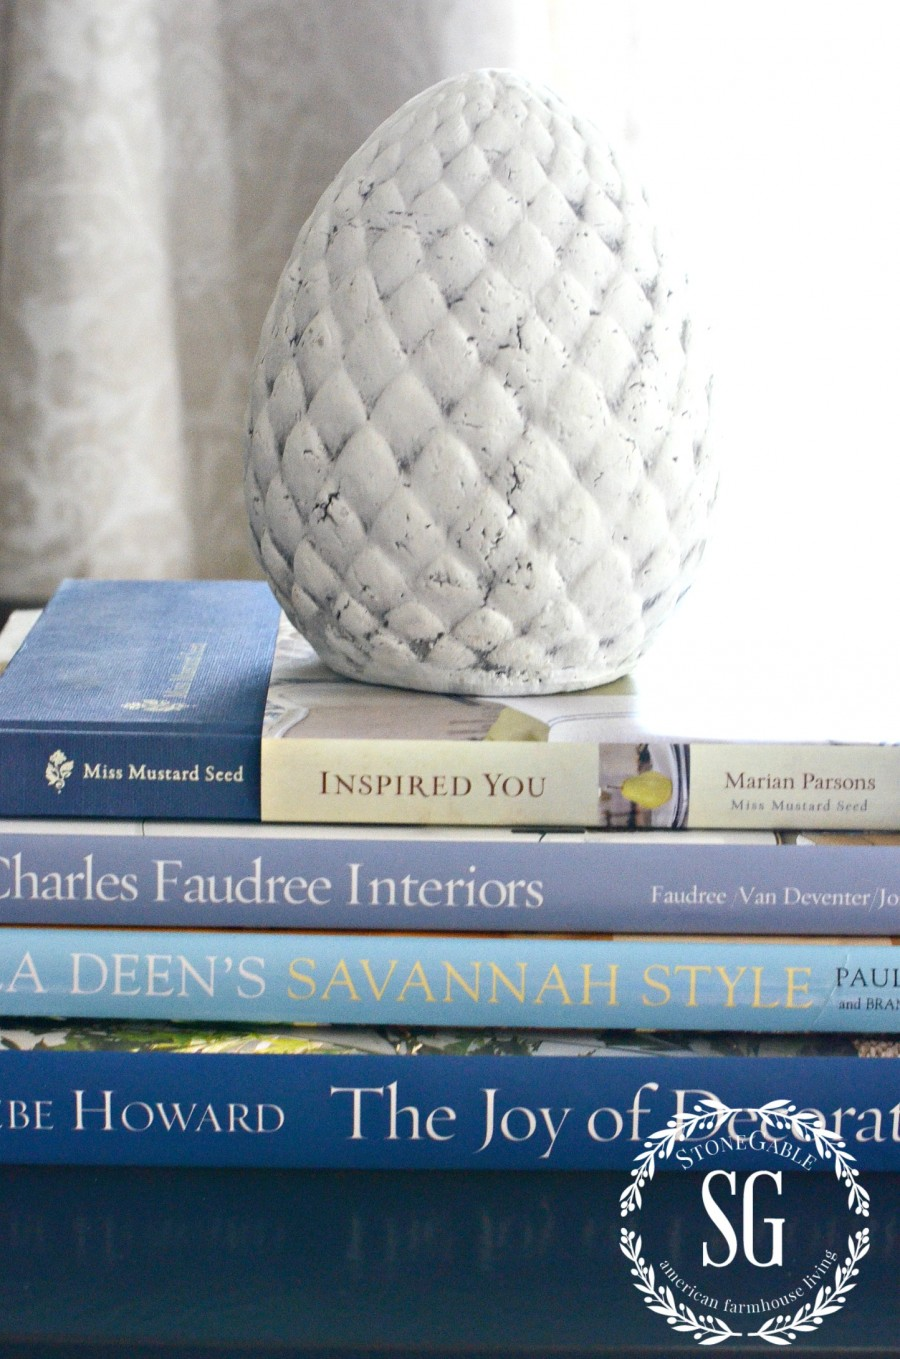 DECORATING WITH BOOKS-budget friendly ideas-books add color-stonegableblog.com